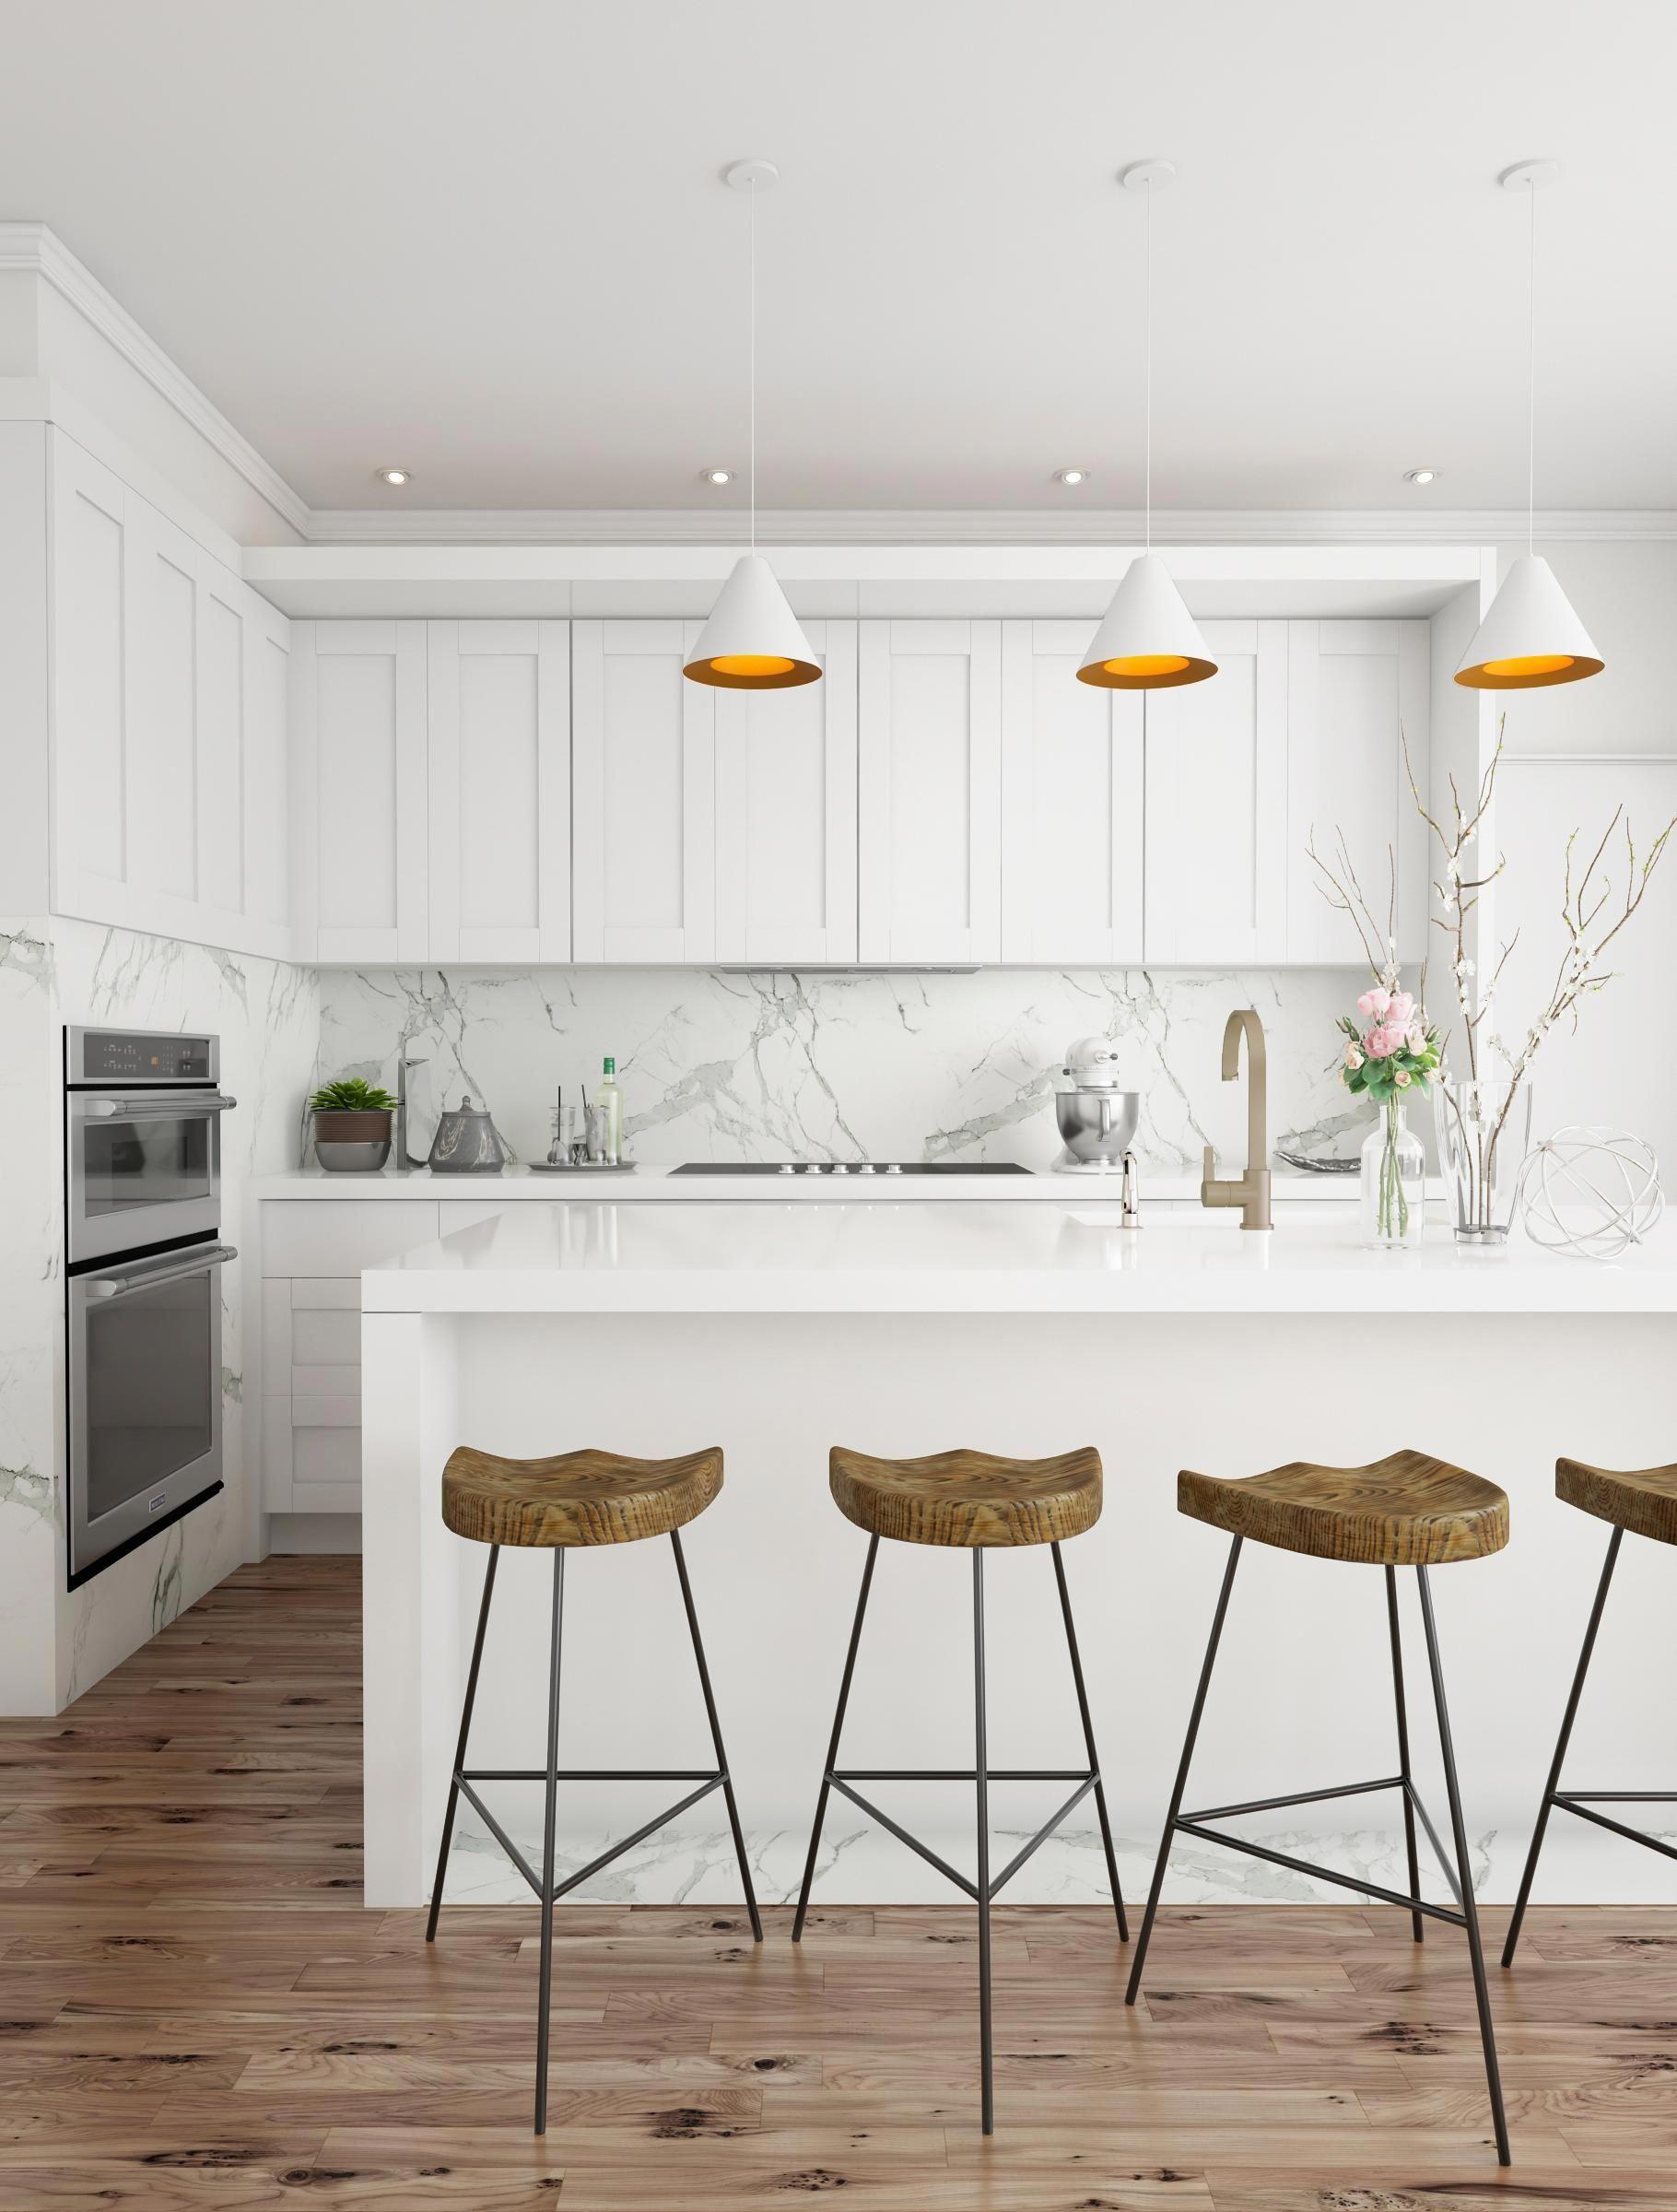 House Decor Stores | Clearance Home Decor | Garden Kitchen ...